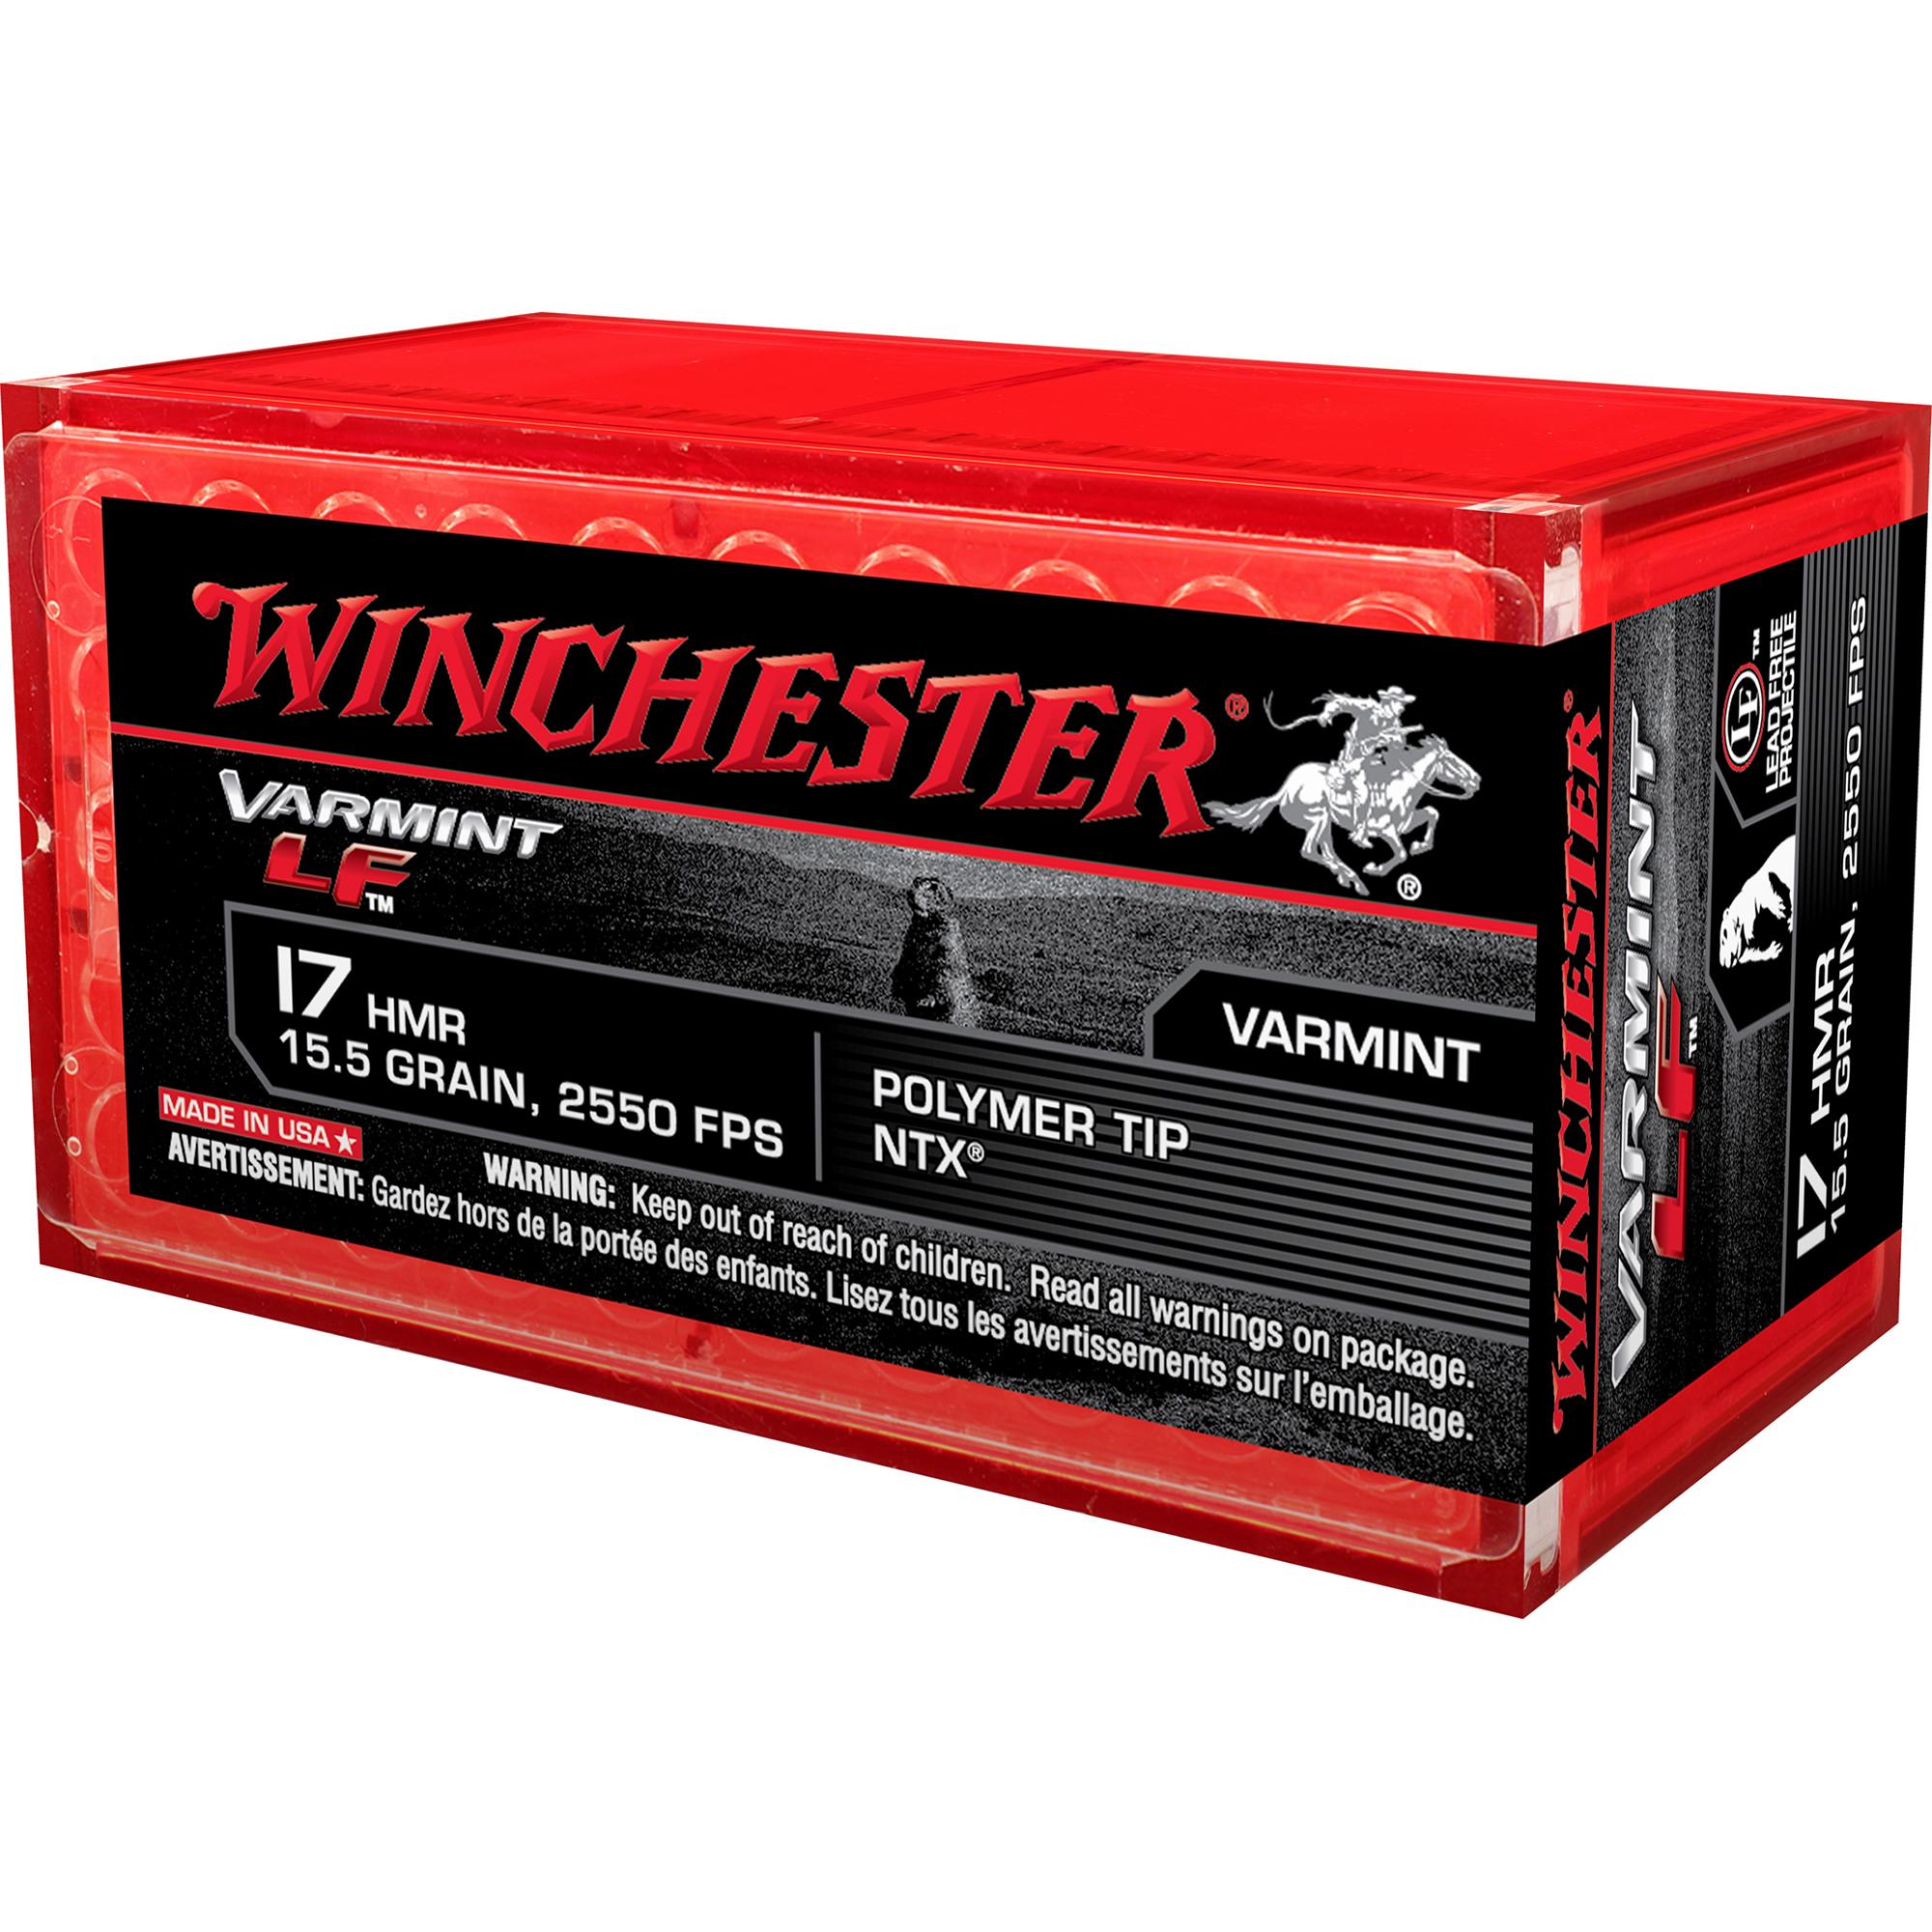 Winchester Varmint LF Rimfire Ammo, .17 HMR, 15.5-gr, NTX Lead Free